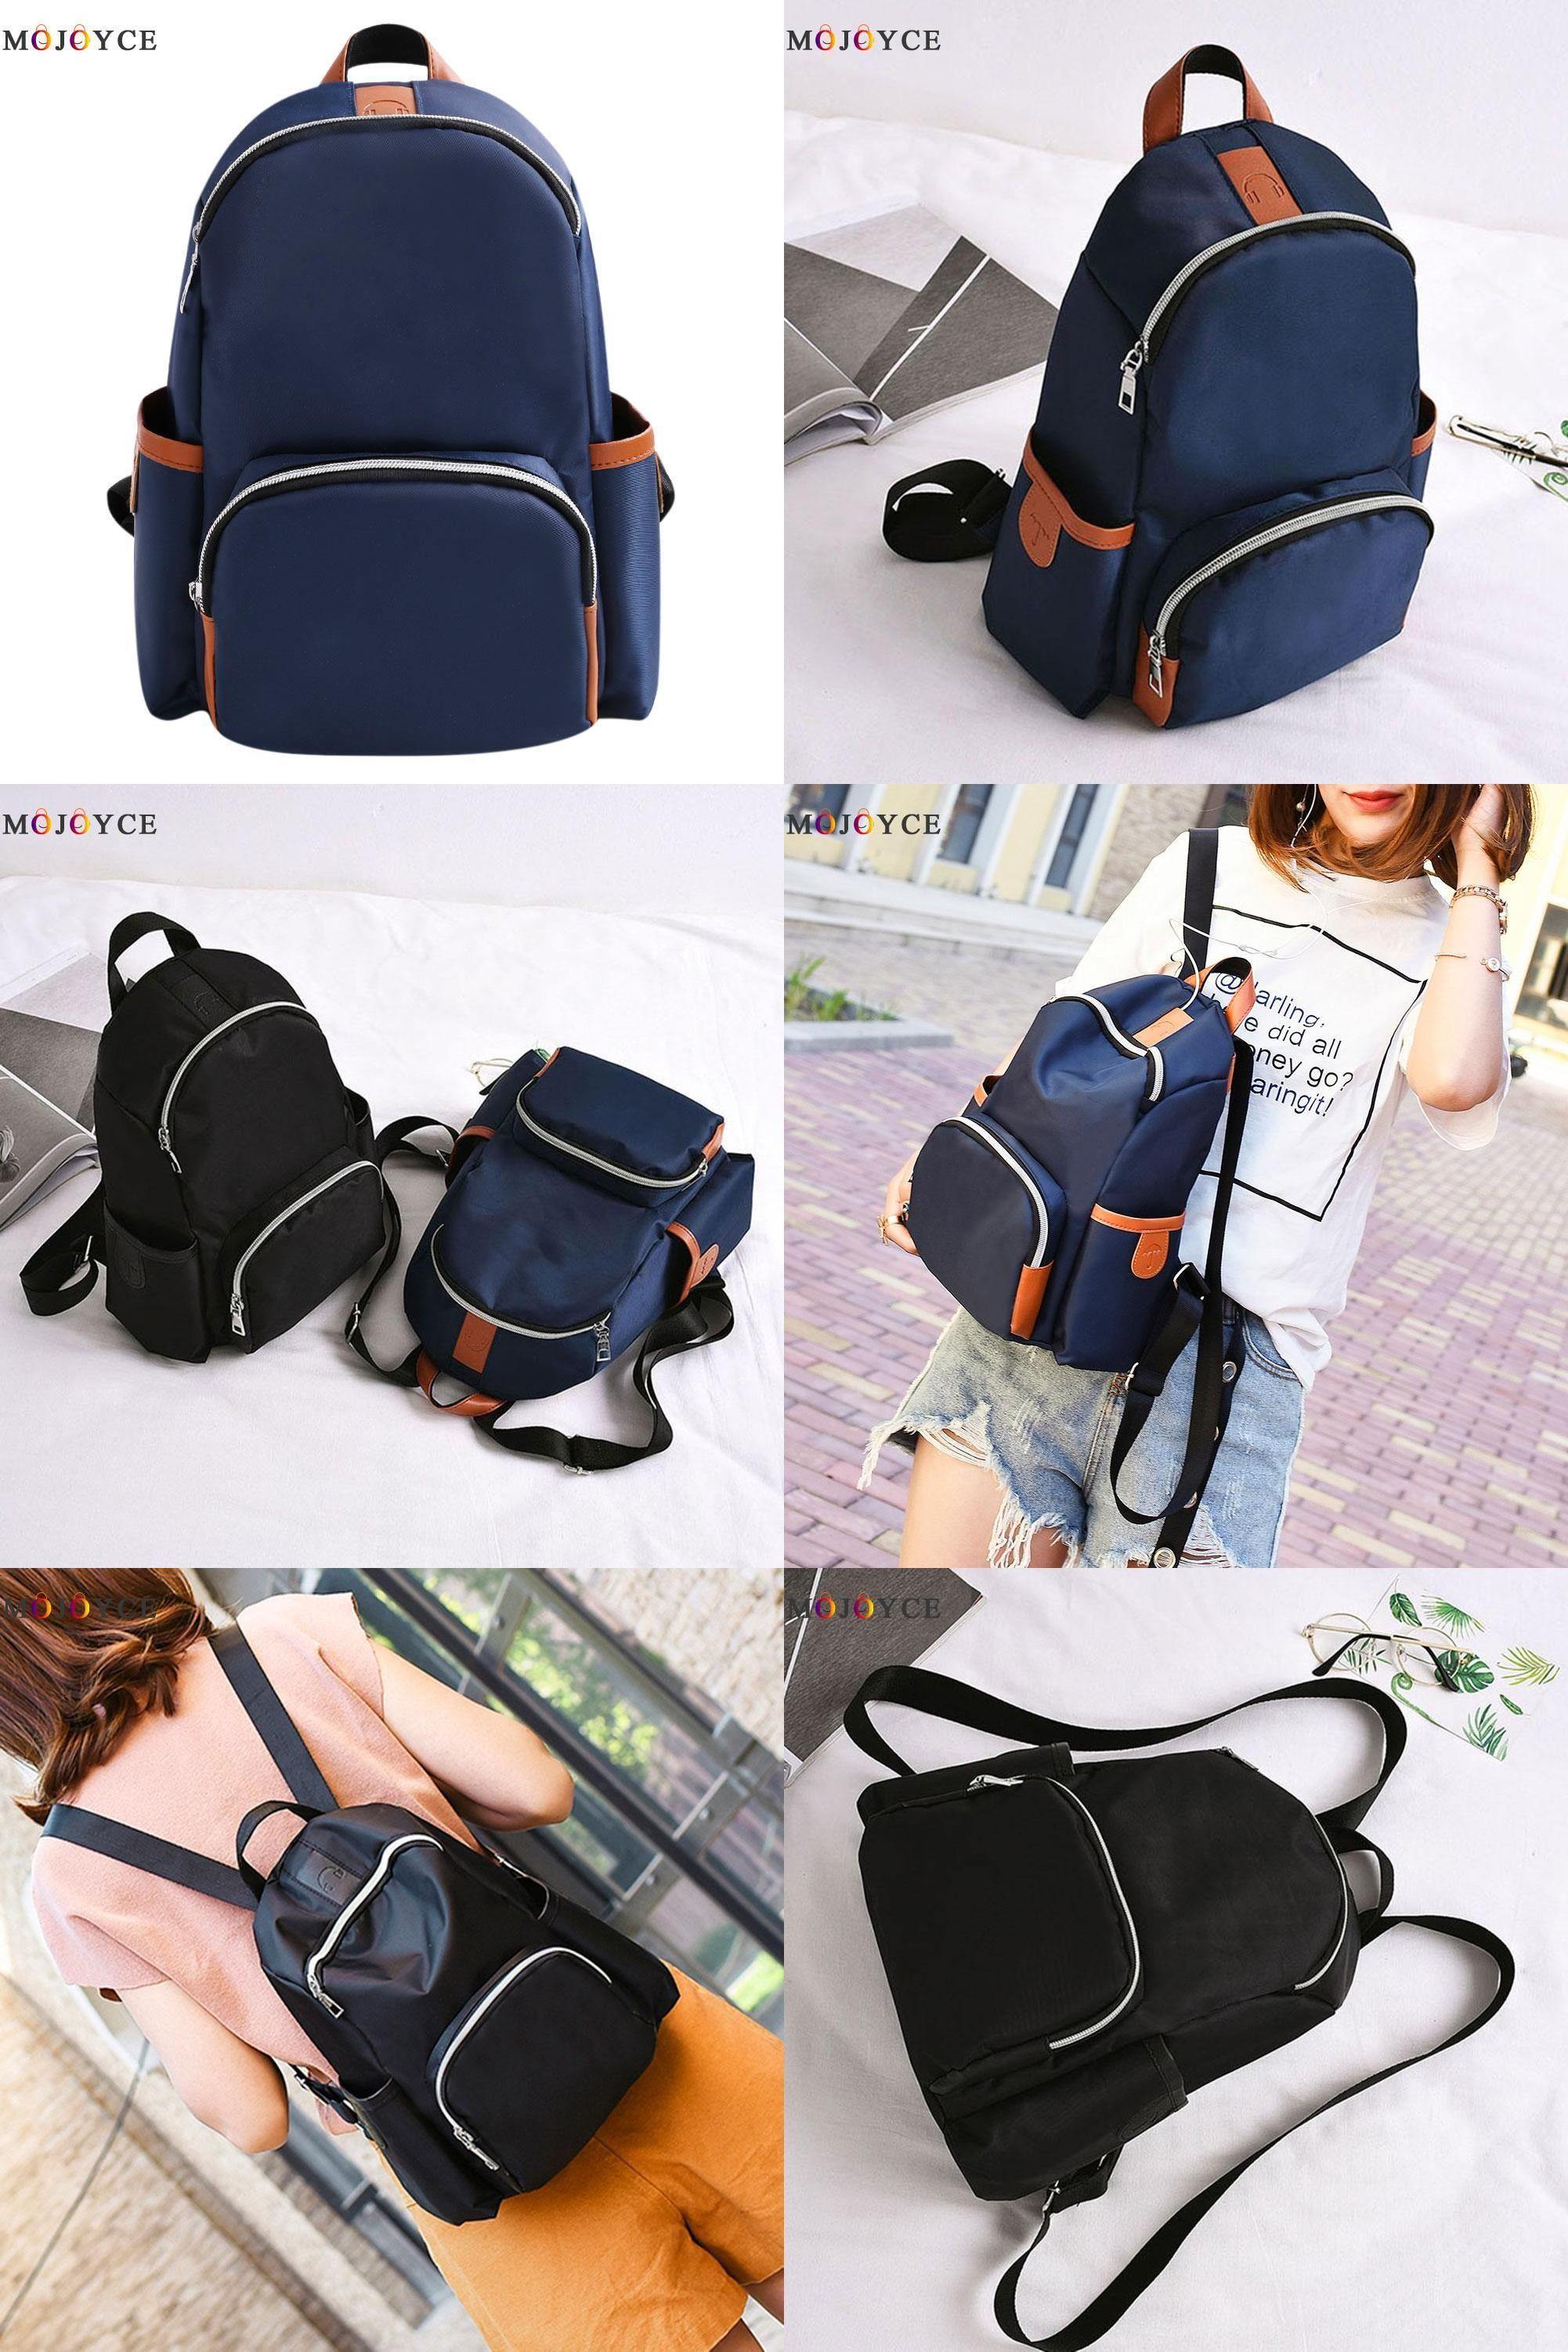 [Visit to Buy] Women Backpack Waterproof Nylon Lady Women's Backpacks Female Casual Travel bag Bags mochila feminina  #Advertisement